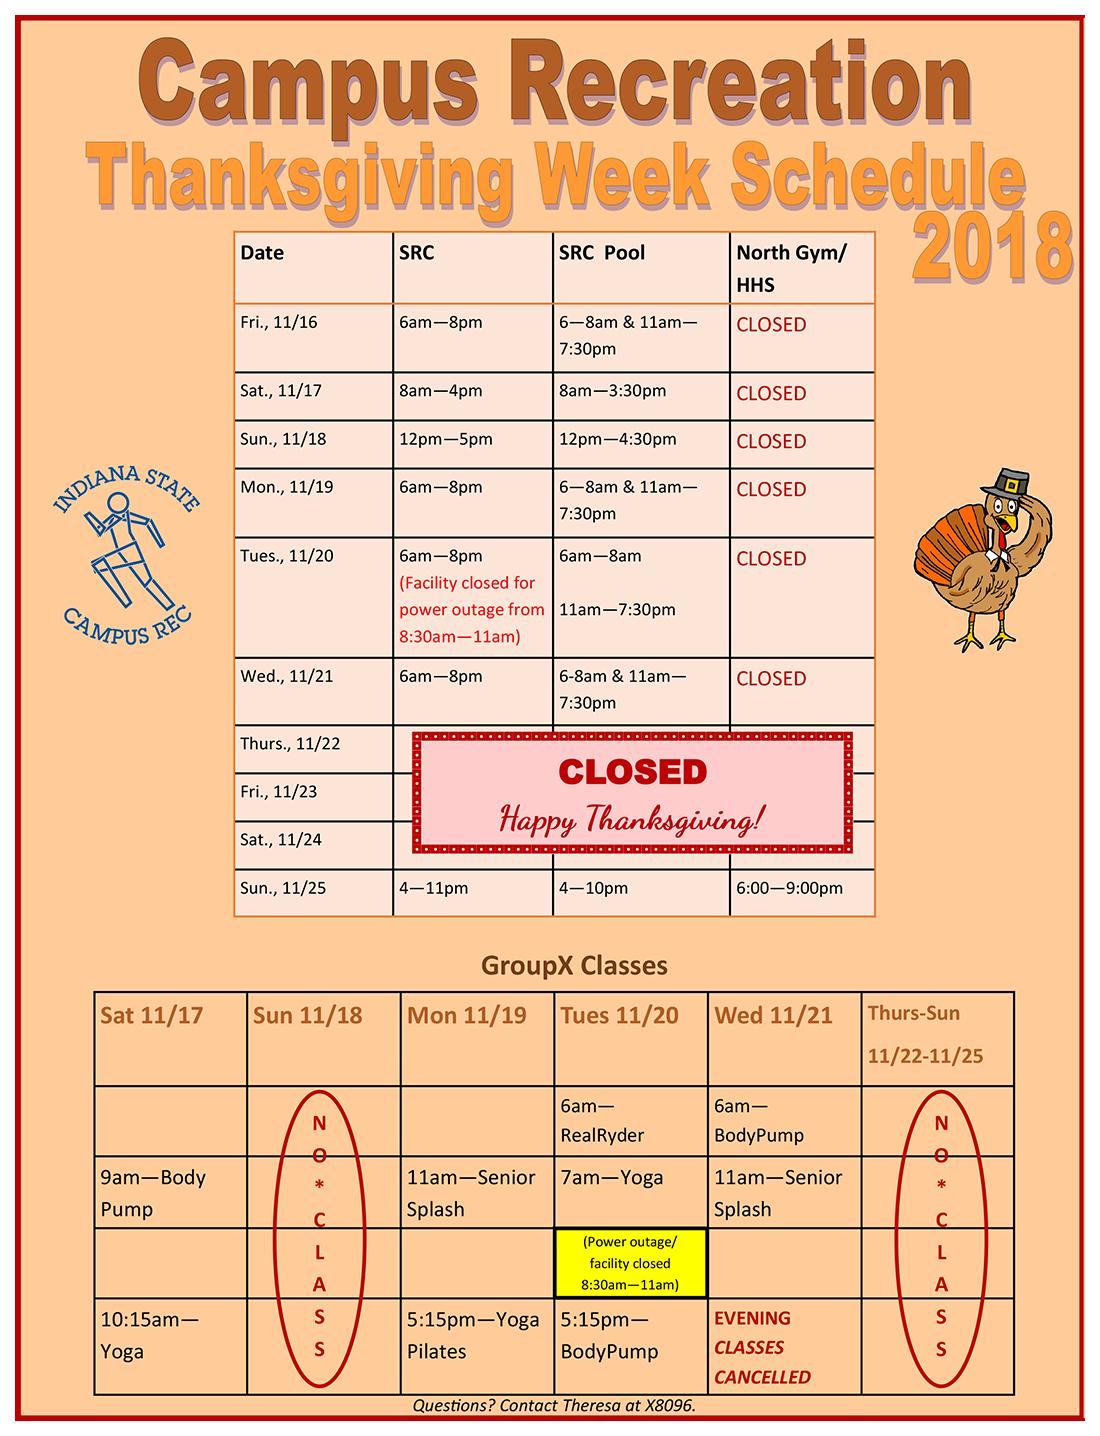 Campus Rec Thanksgiving 2018 Schedule